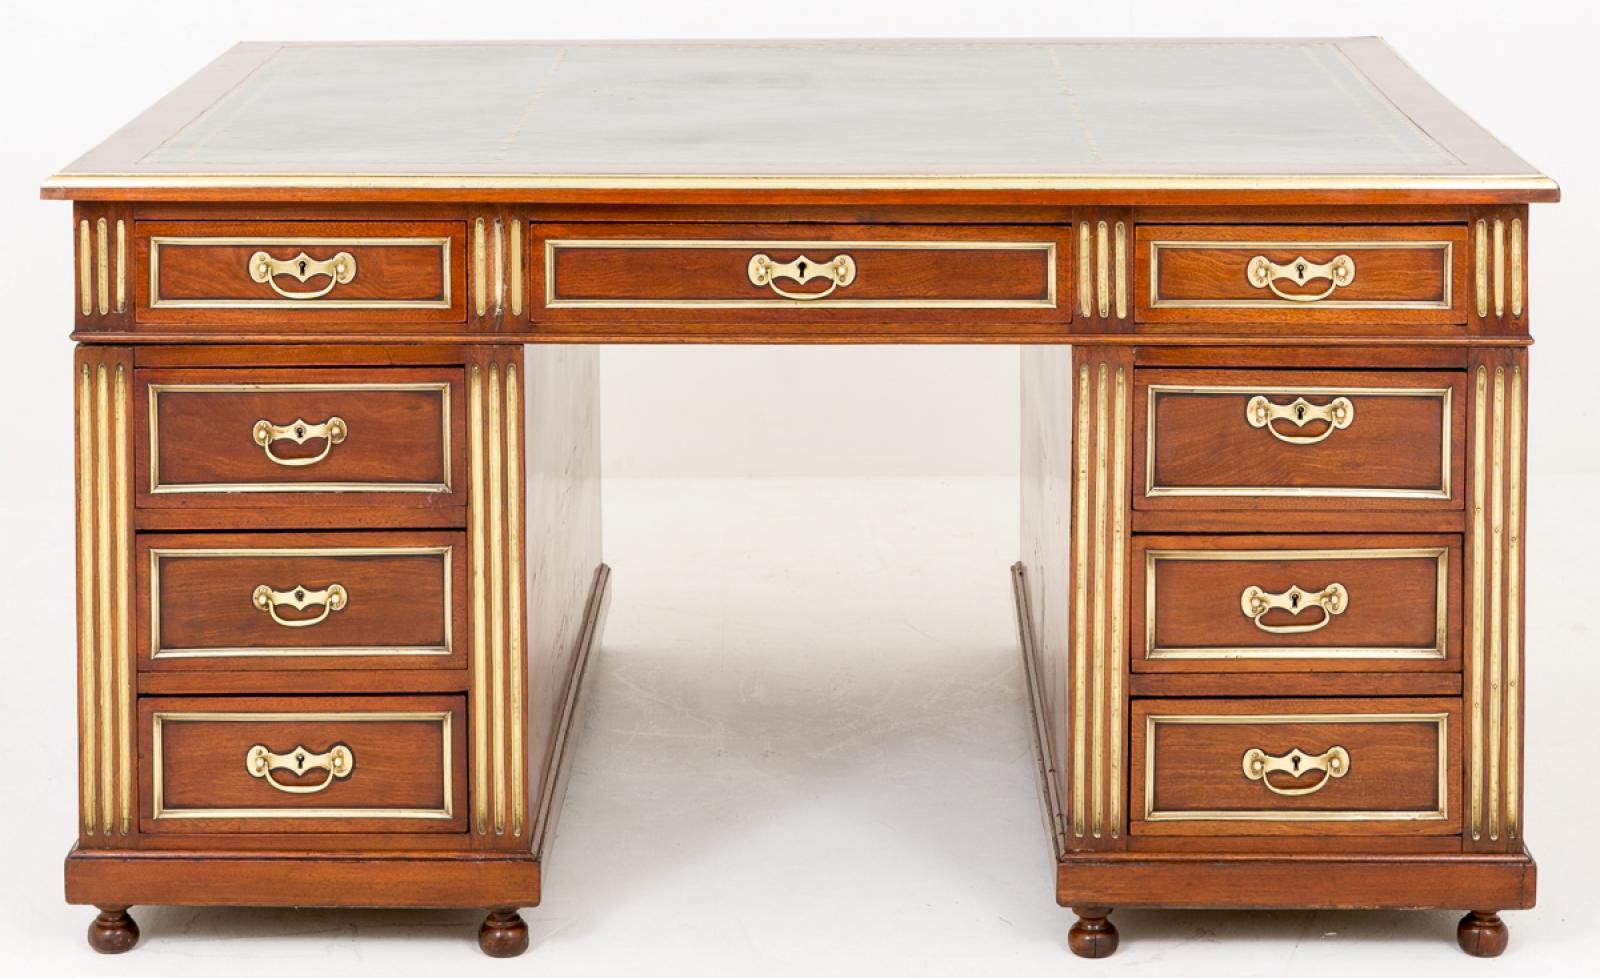 Piece Description A Superb French Mahogany And Gilt 18 Drawer Partners Desk